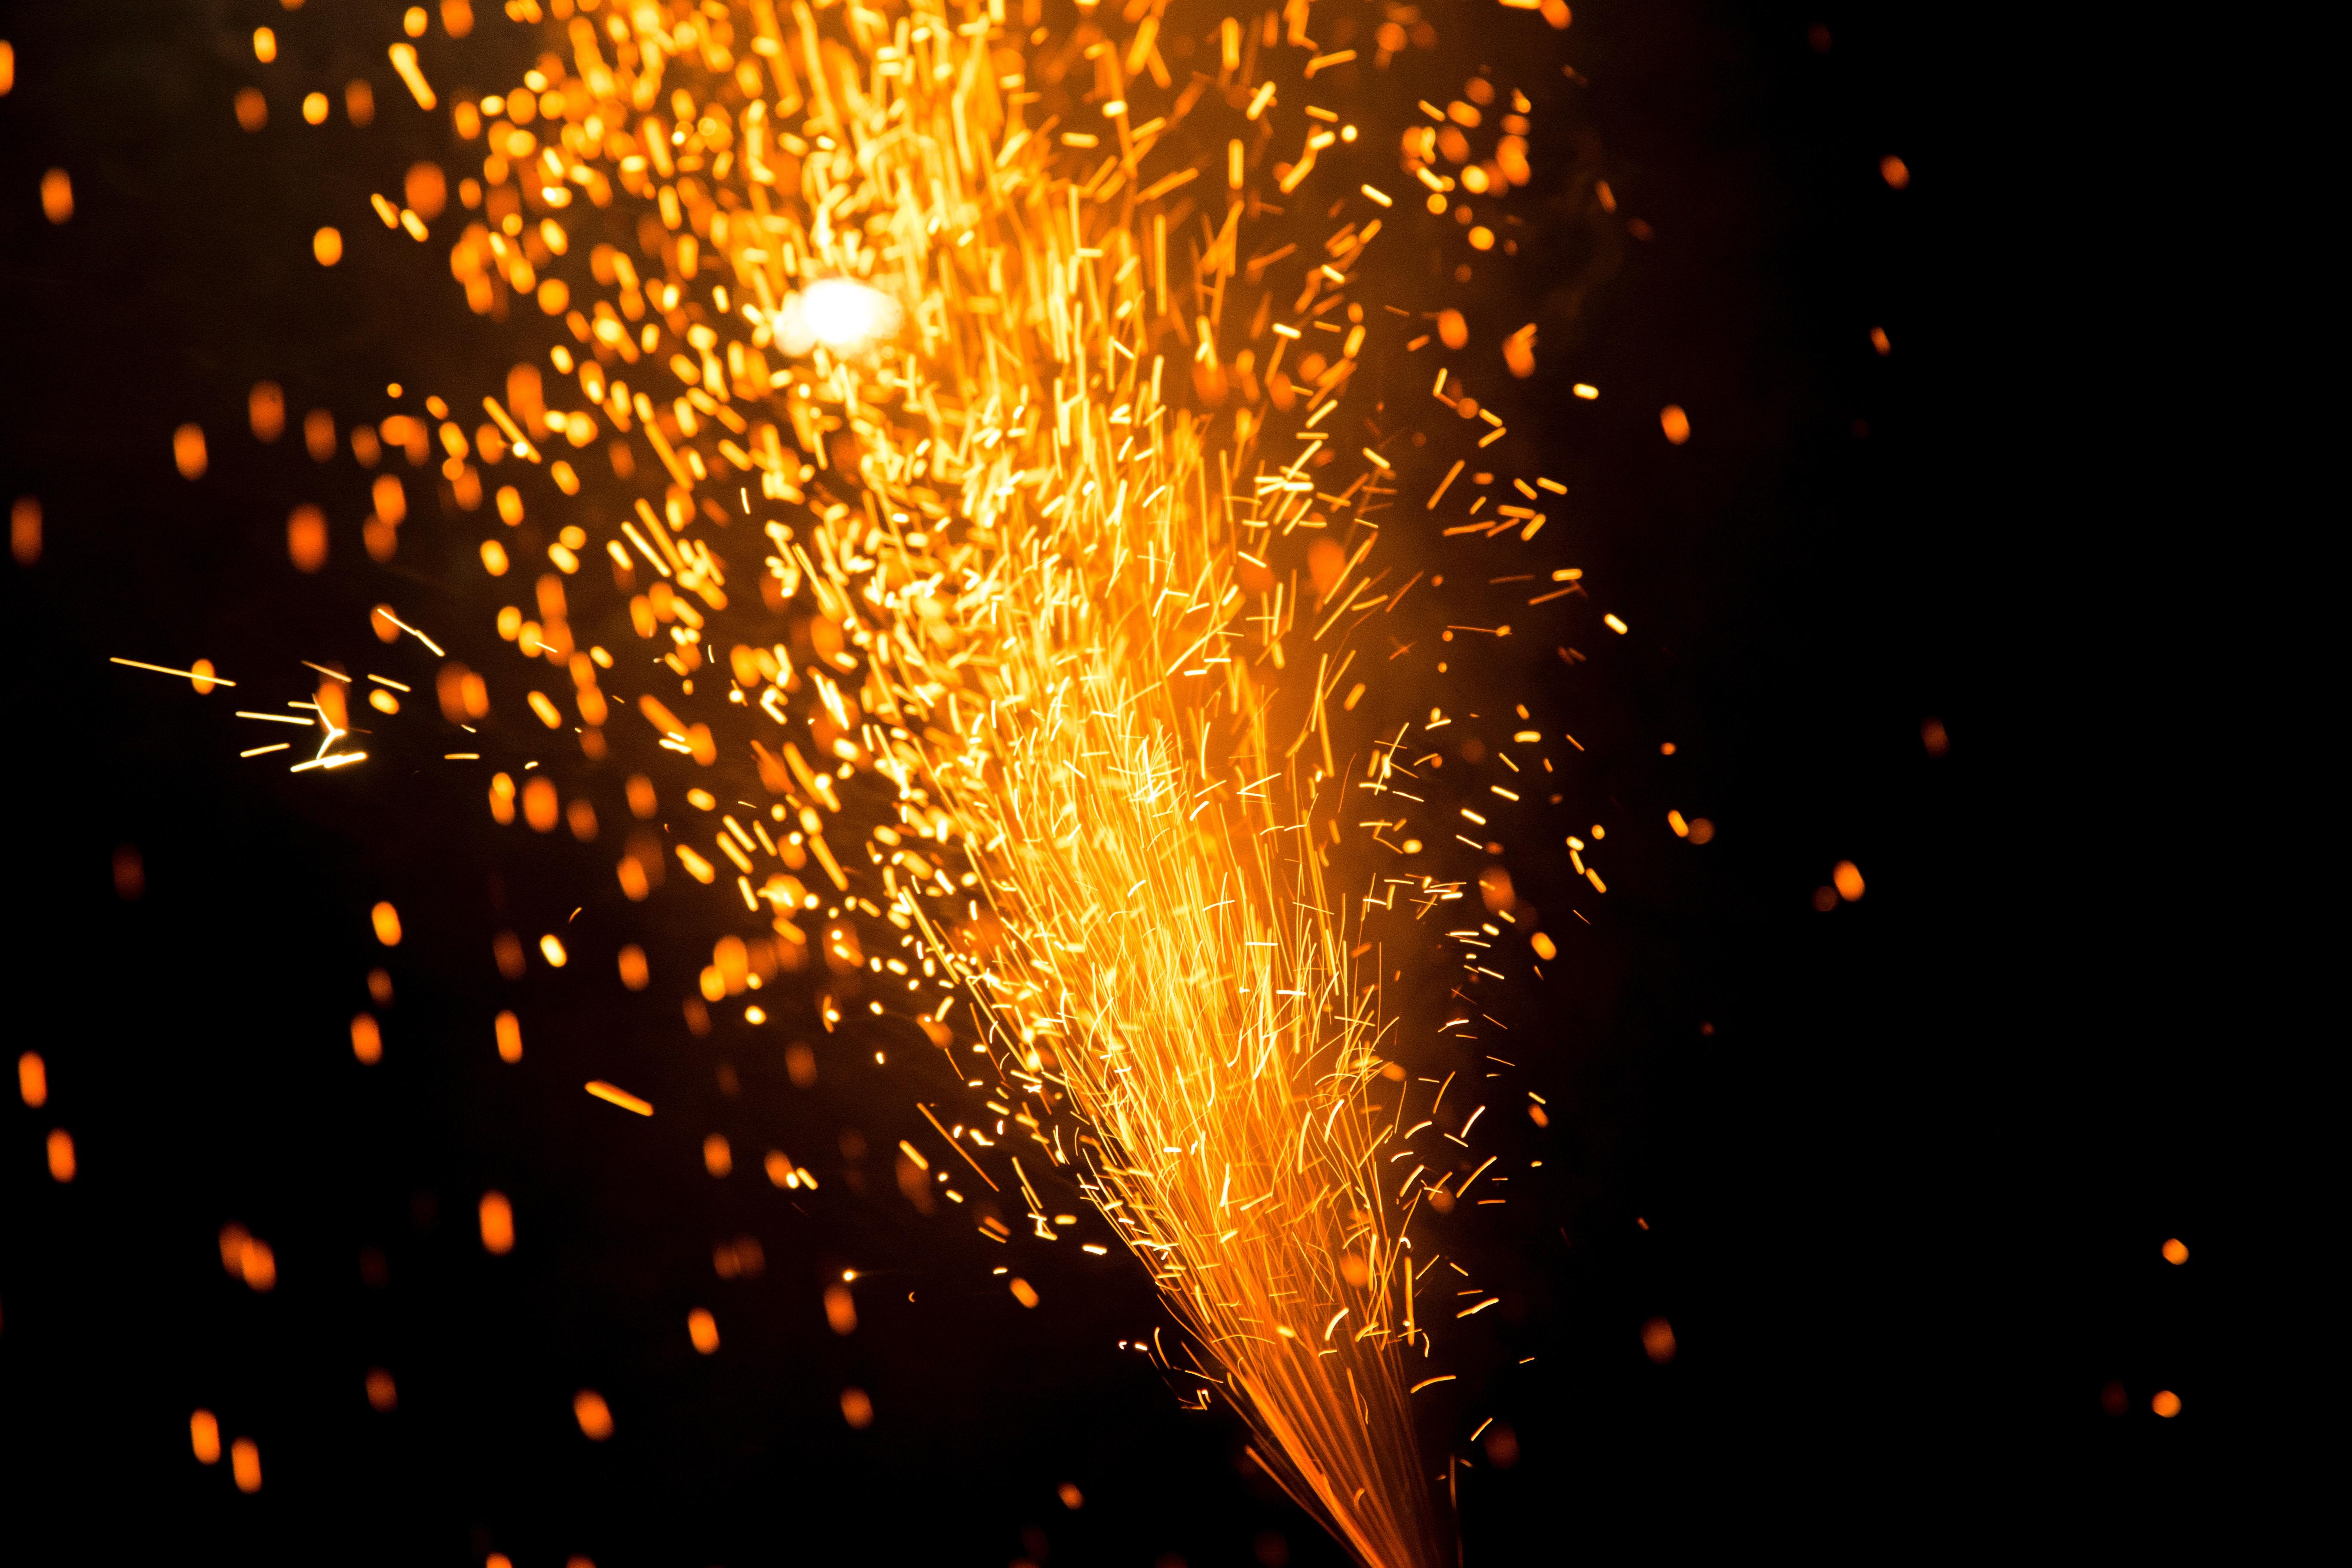 Gambar langit kilau kegelapan kembang api pesta peristiwa langit malam kilau kegelapan kembang api pesta peristiwa diwali malam tahun baru atmosfer bumi komputer wallpaper voltagebd Images